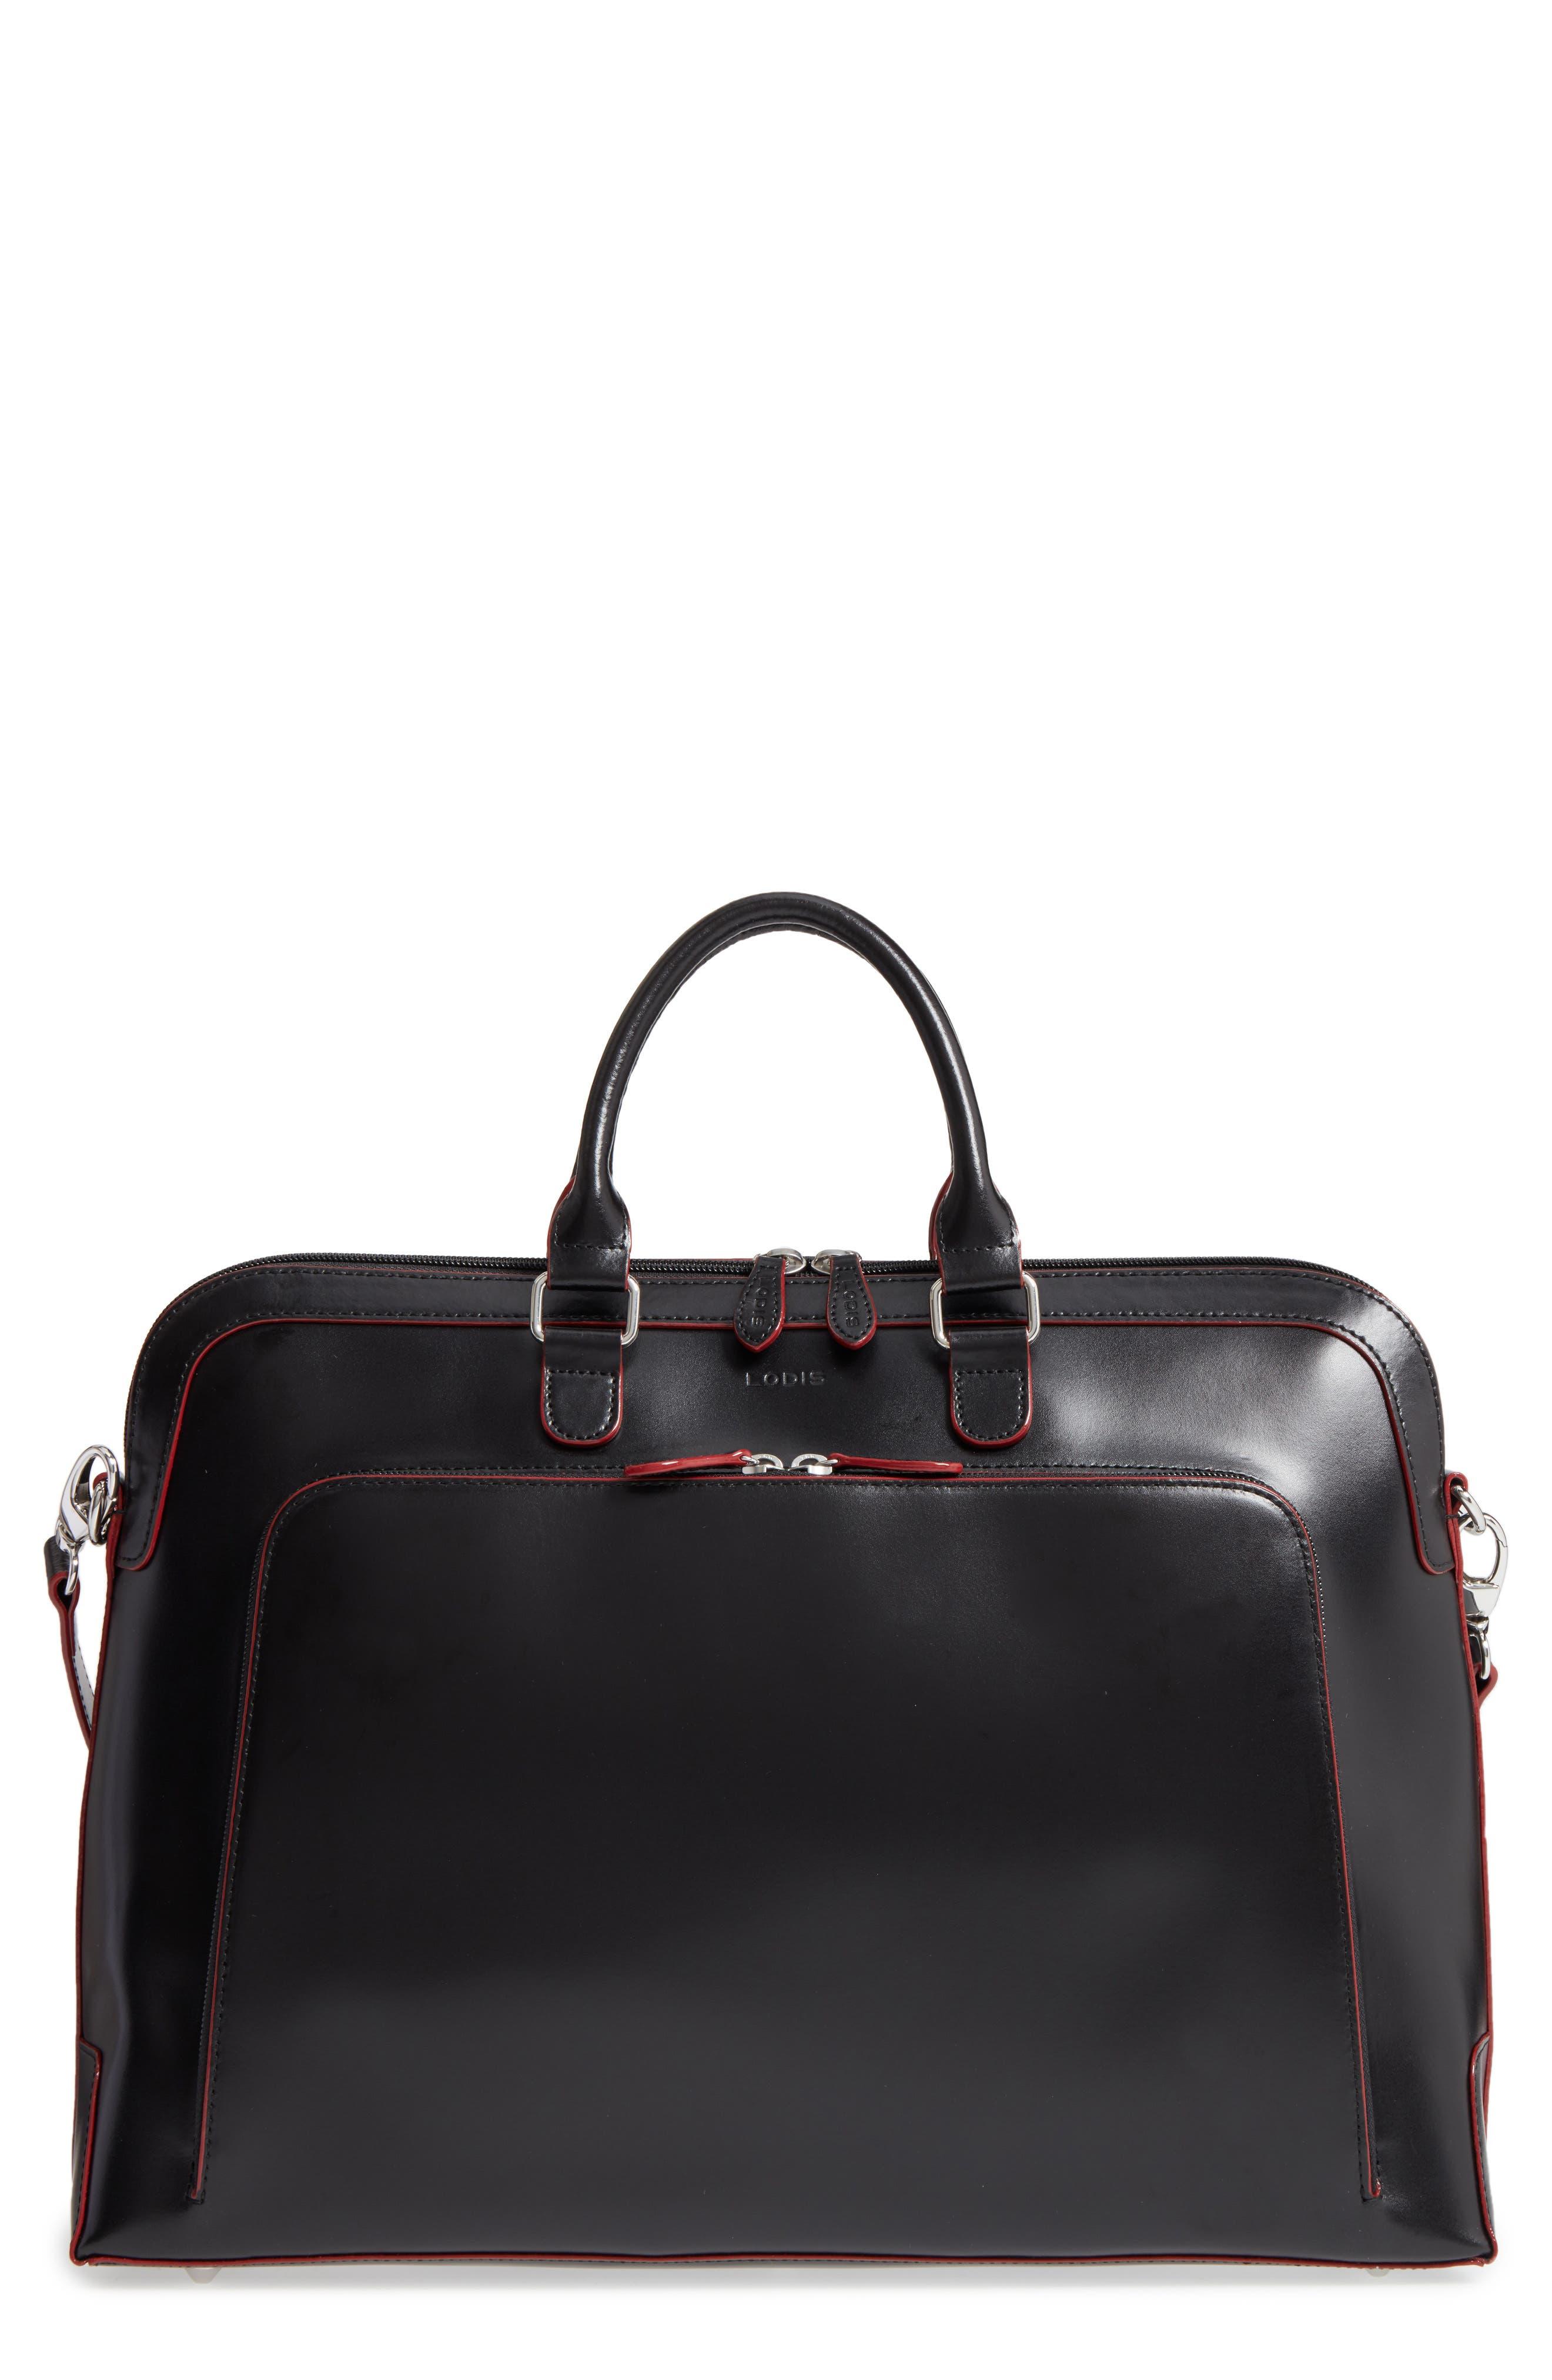 Audrey Under Lock & Key - Brera RFID Leather Briefcase,                             Main thumbnail 1, color,                             Black